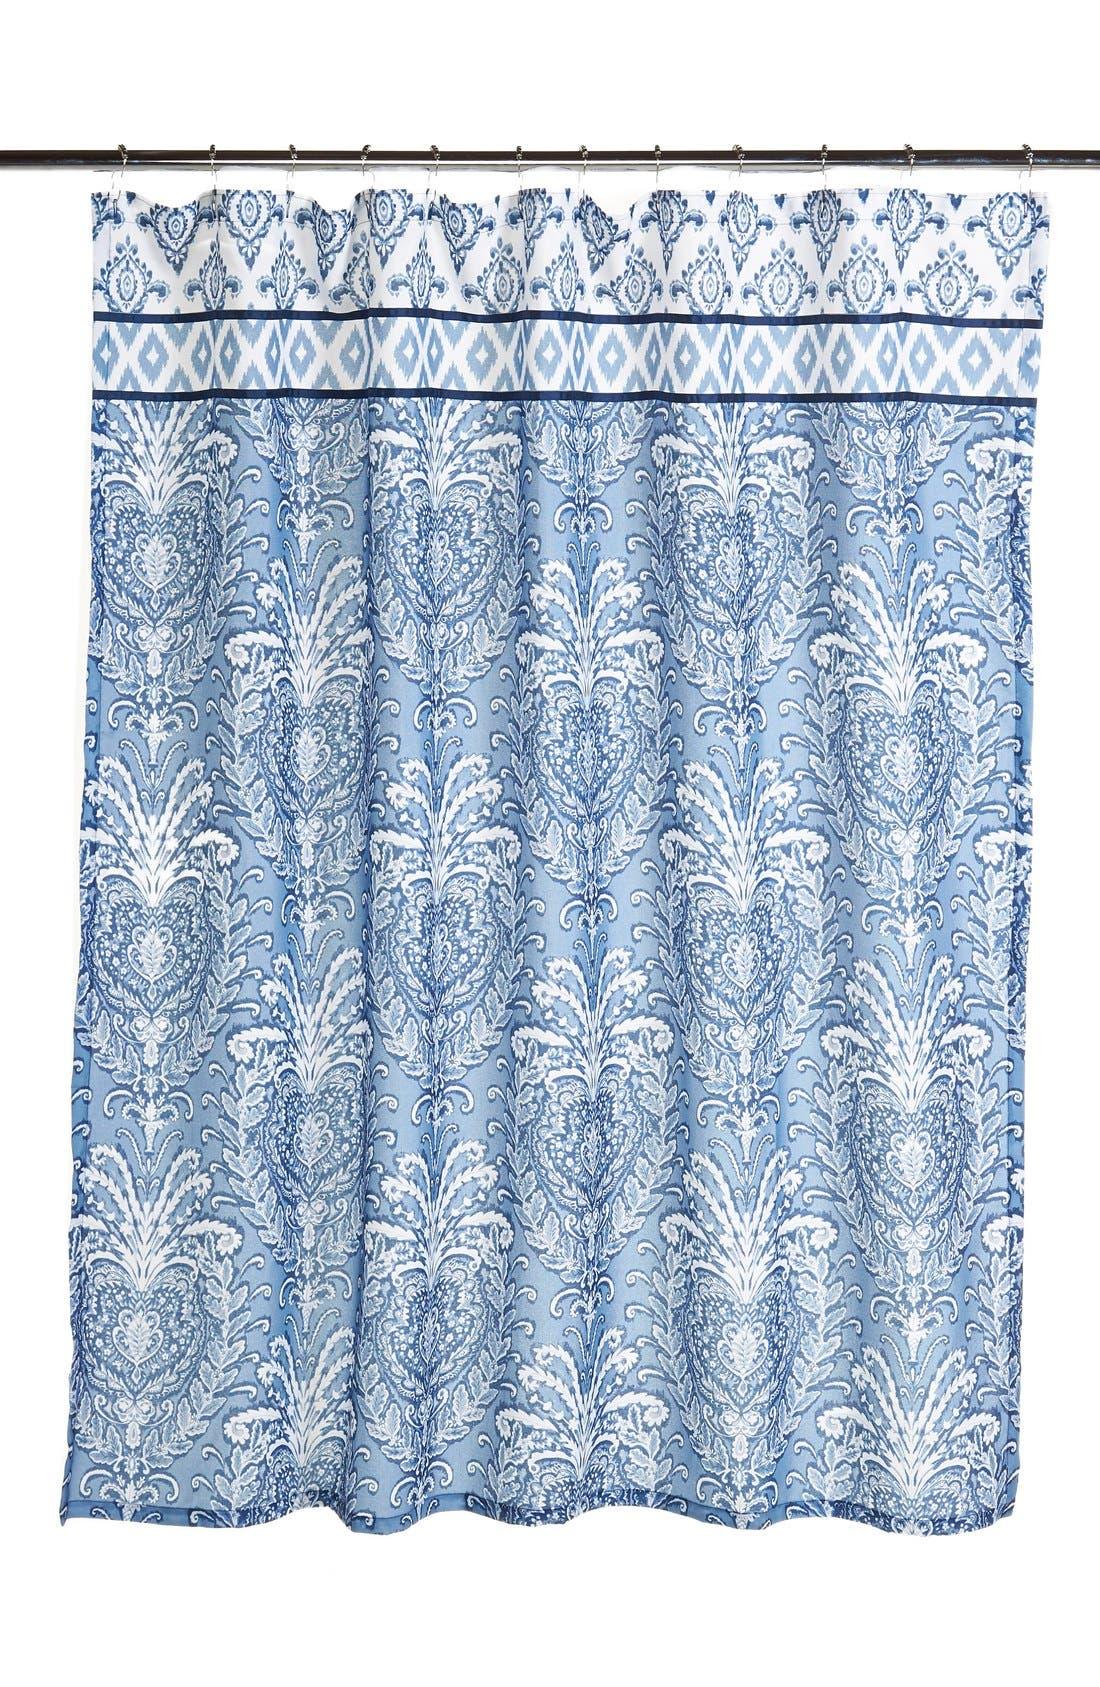 Main Image - Dena Home 'Madison' Ikat Print Shower Curtain